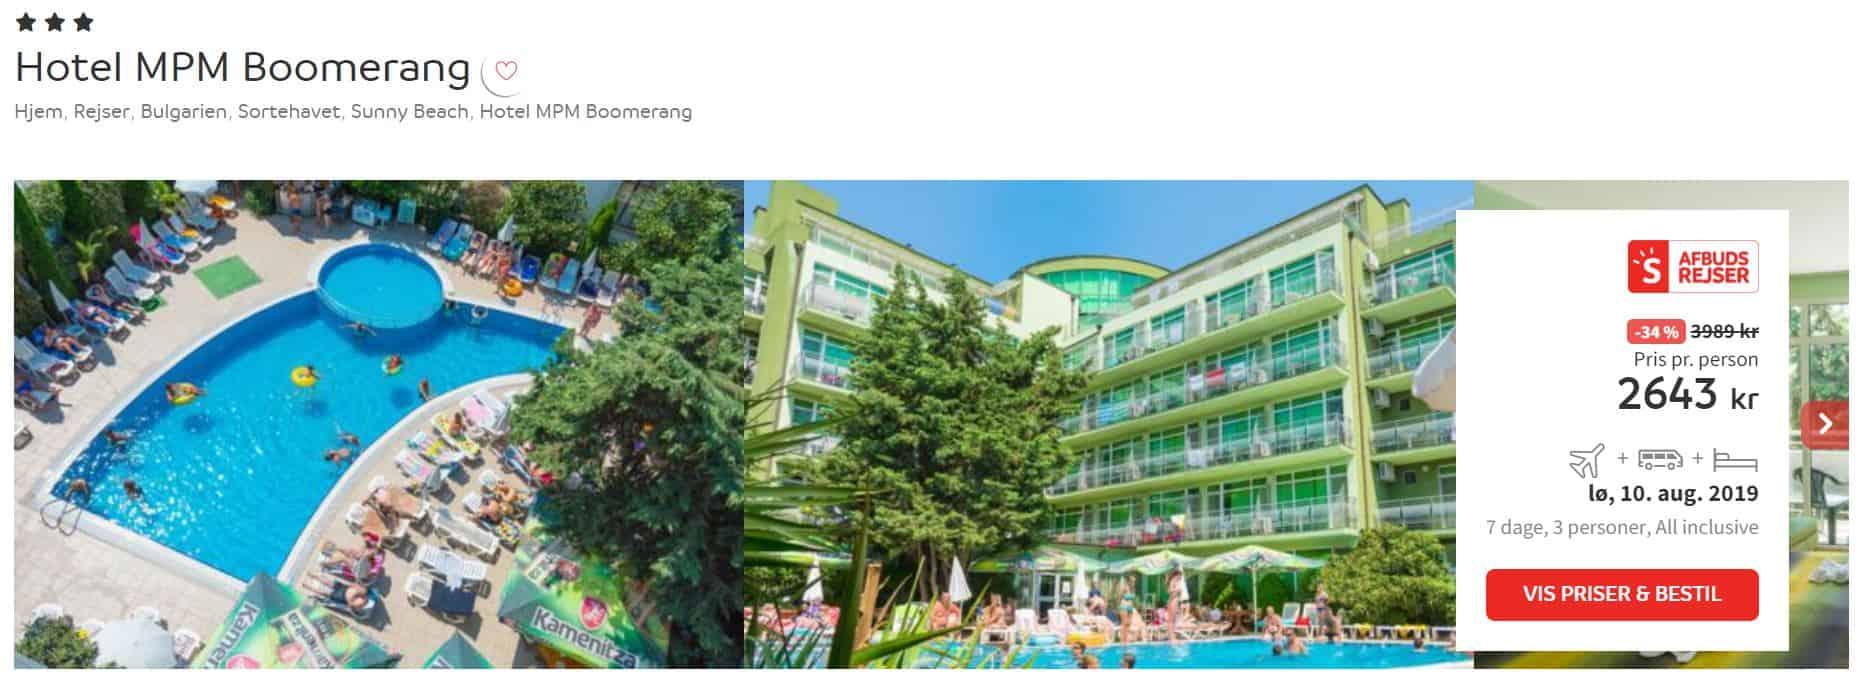 Hotel MPM Boomerang - Sunny Beach i Bulgarien